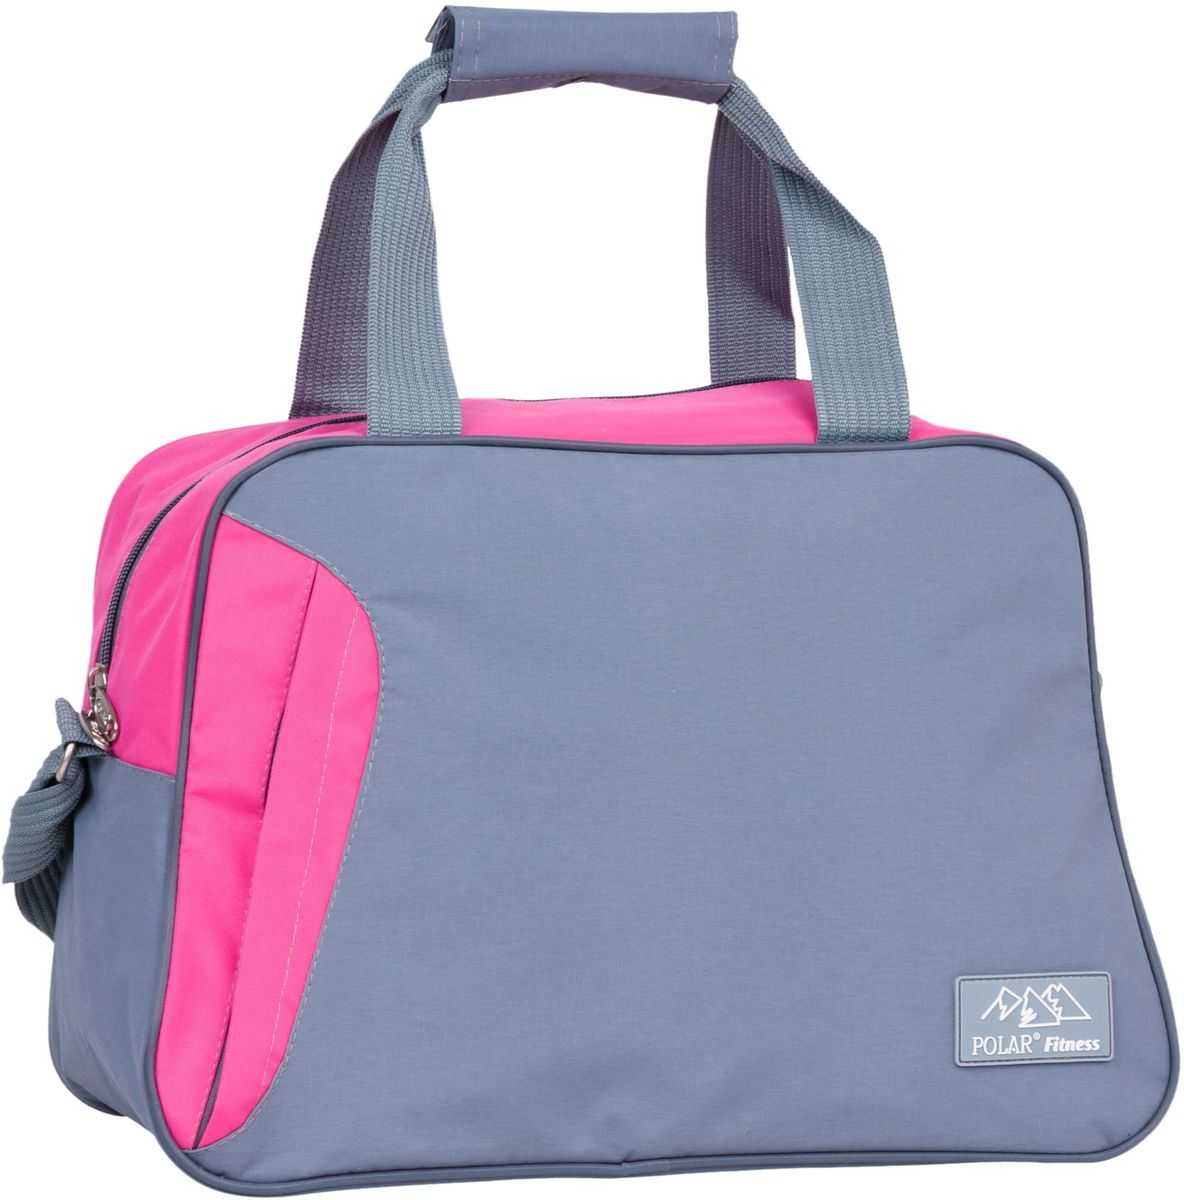 Сумка спортивная Polar, цвет: серый, розовый, 30 л. П7071 рюкзак polar polar po001buawne5